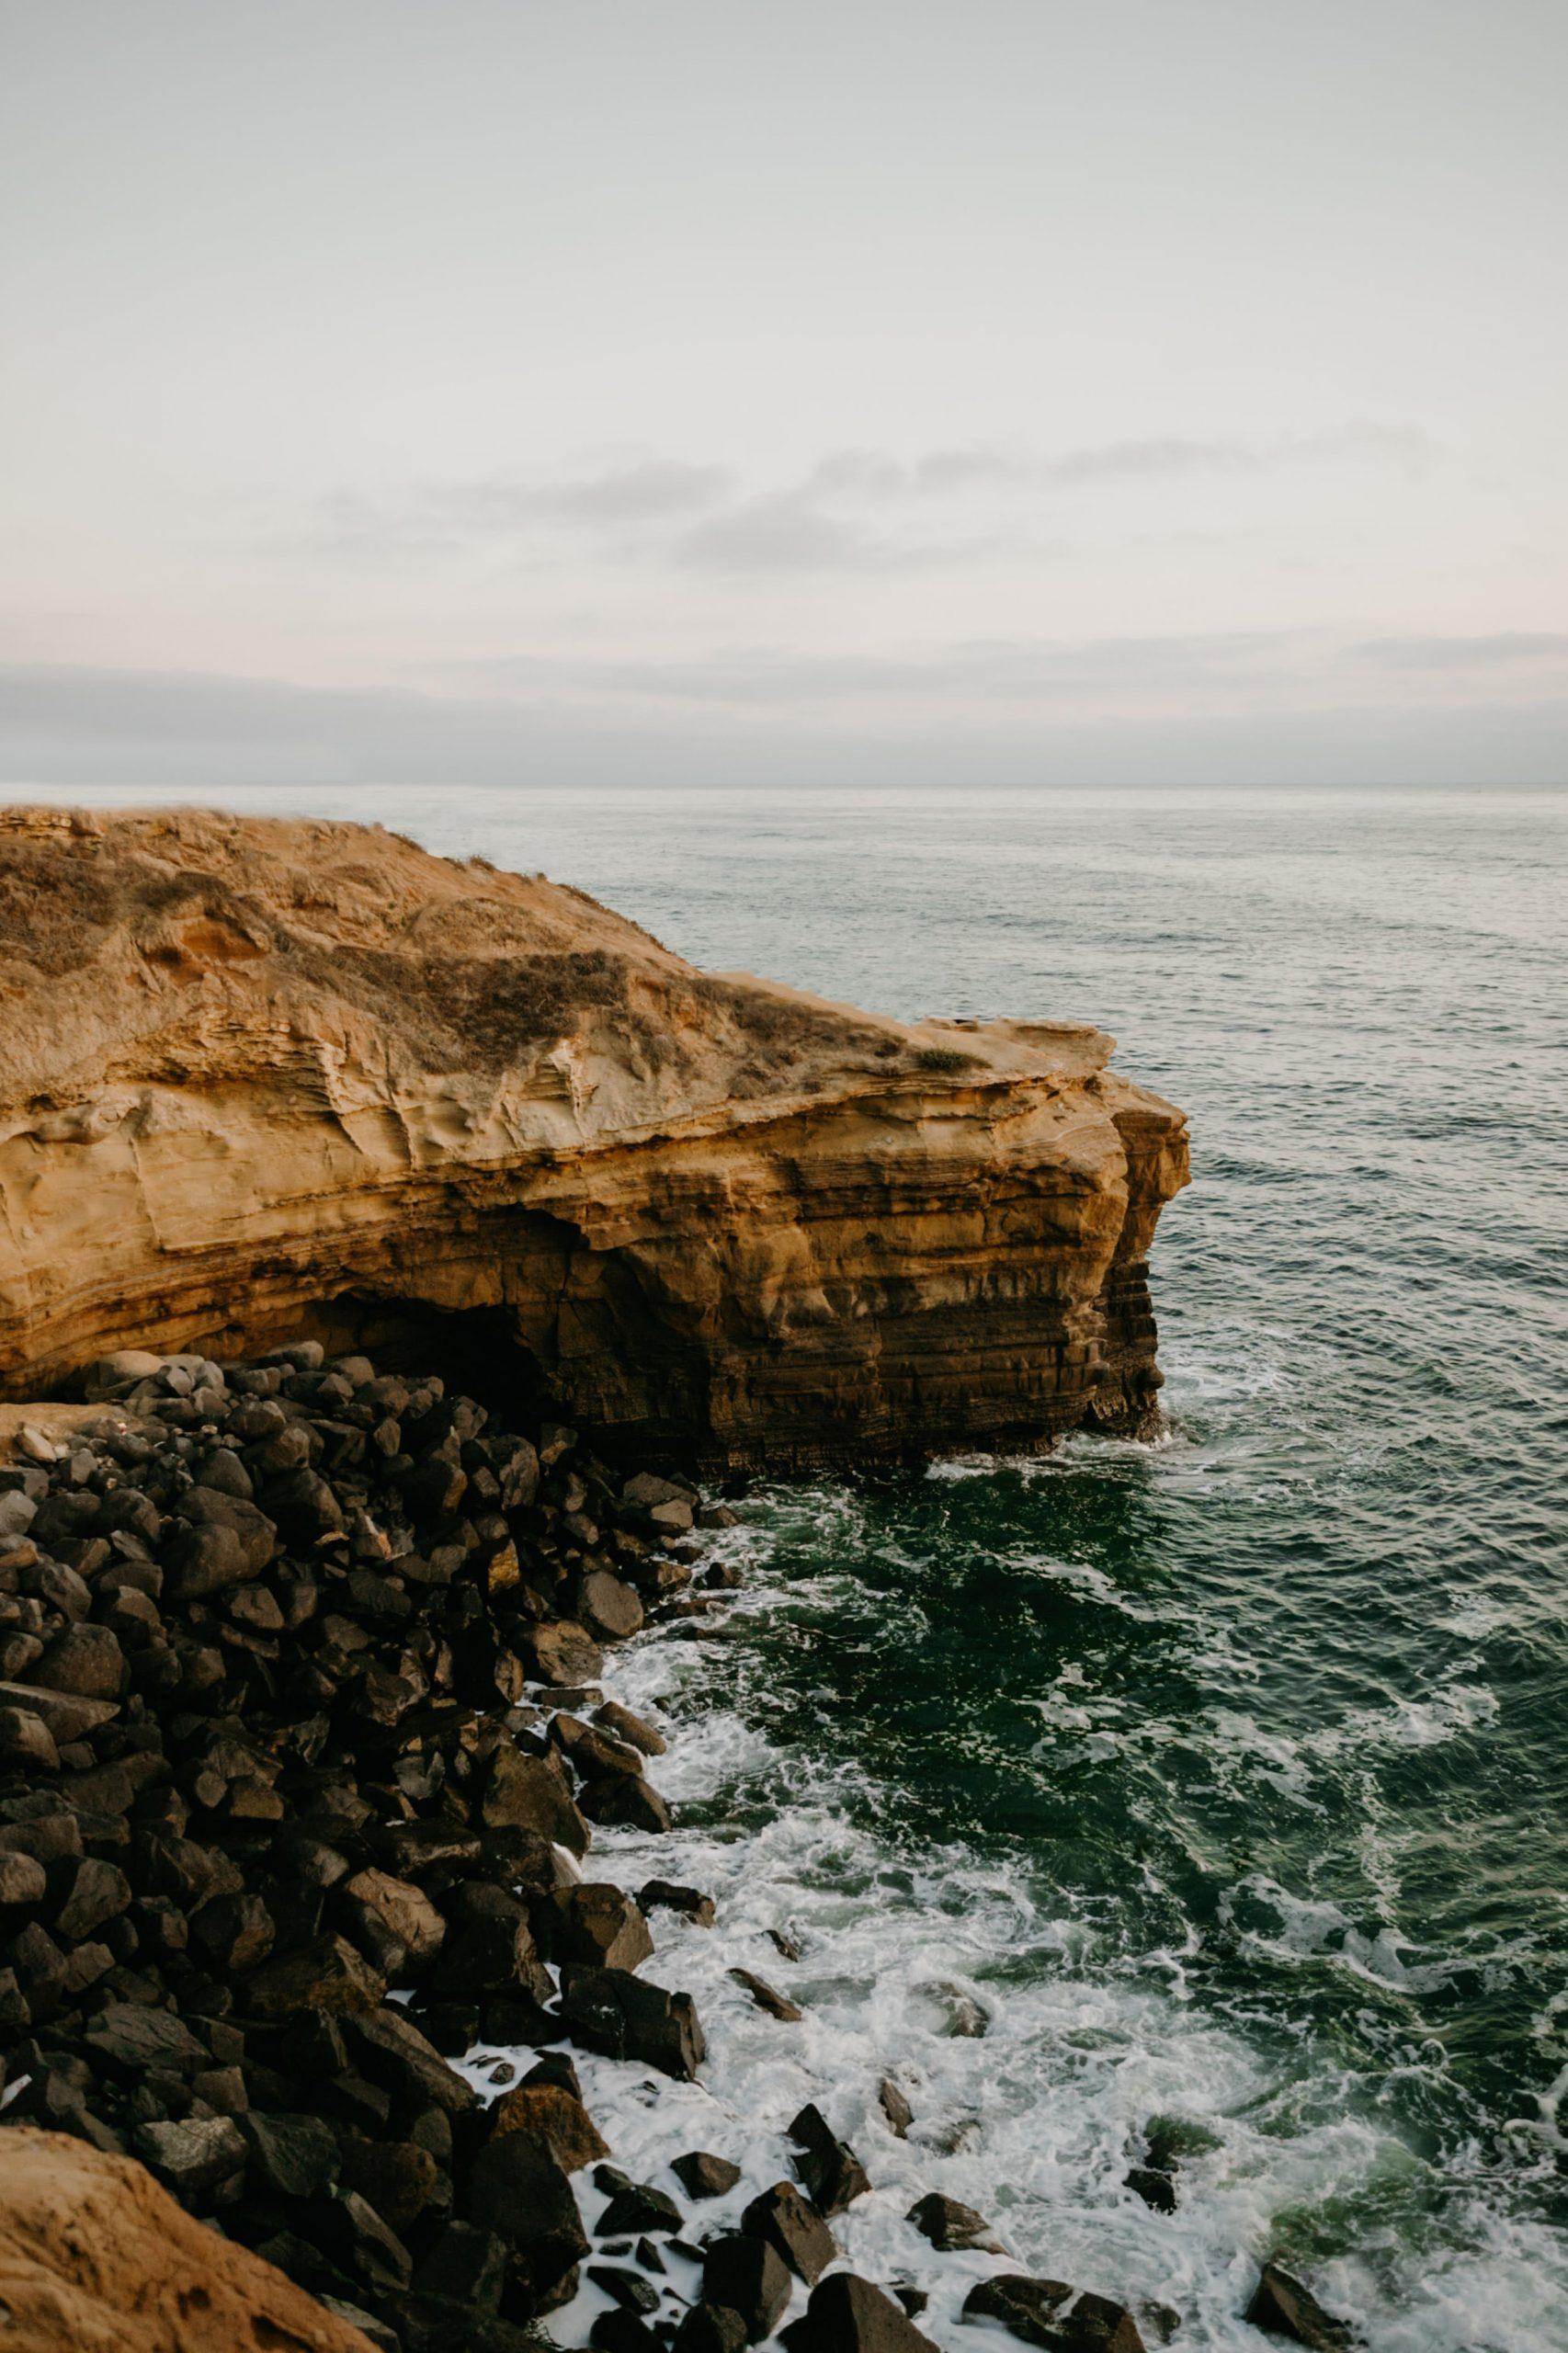 Sunset Cliffs Phone Wallpaper, image by Fatima Elreda Photo